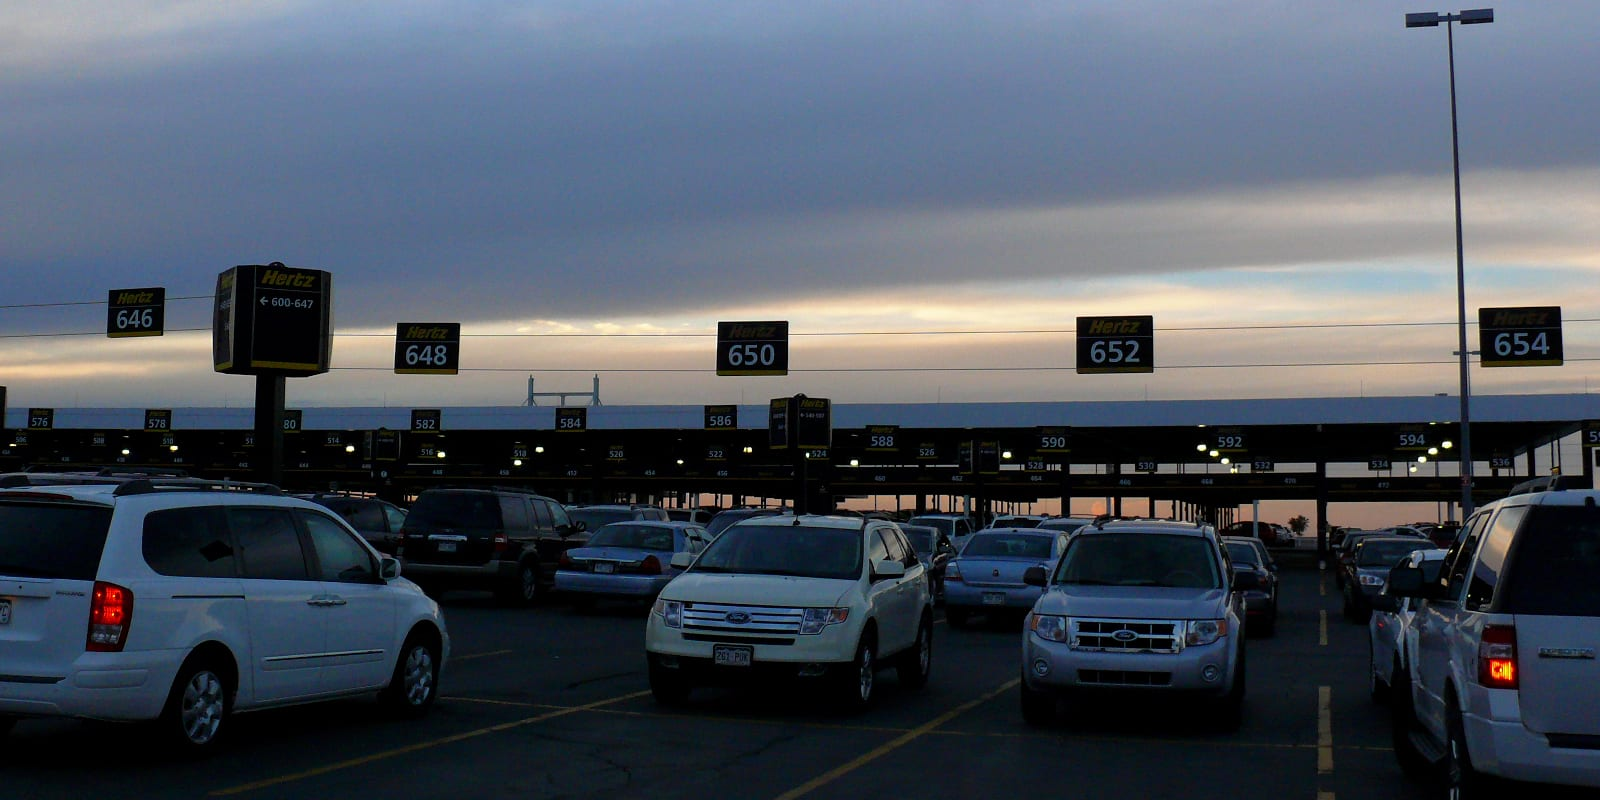 Car Rentals Denver Airport Hertz Parking Lot